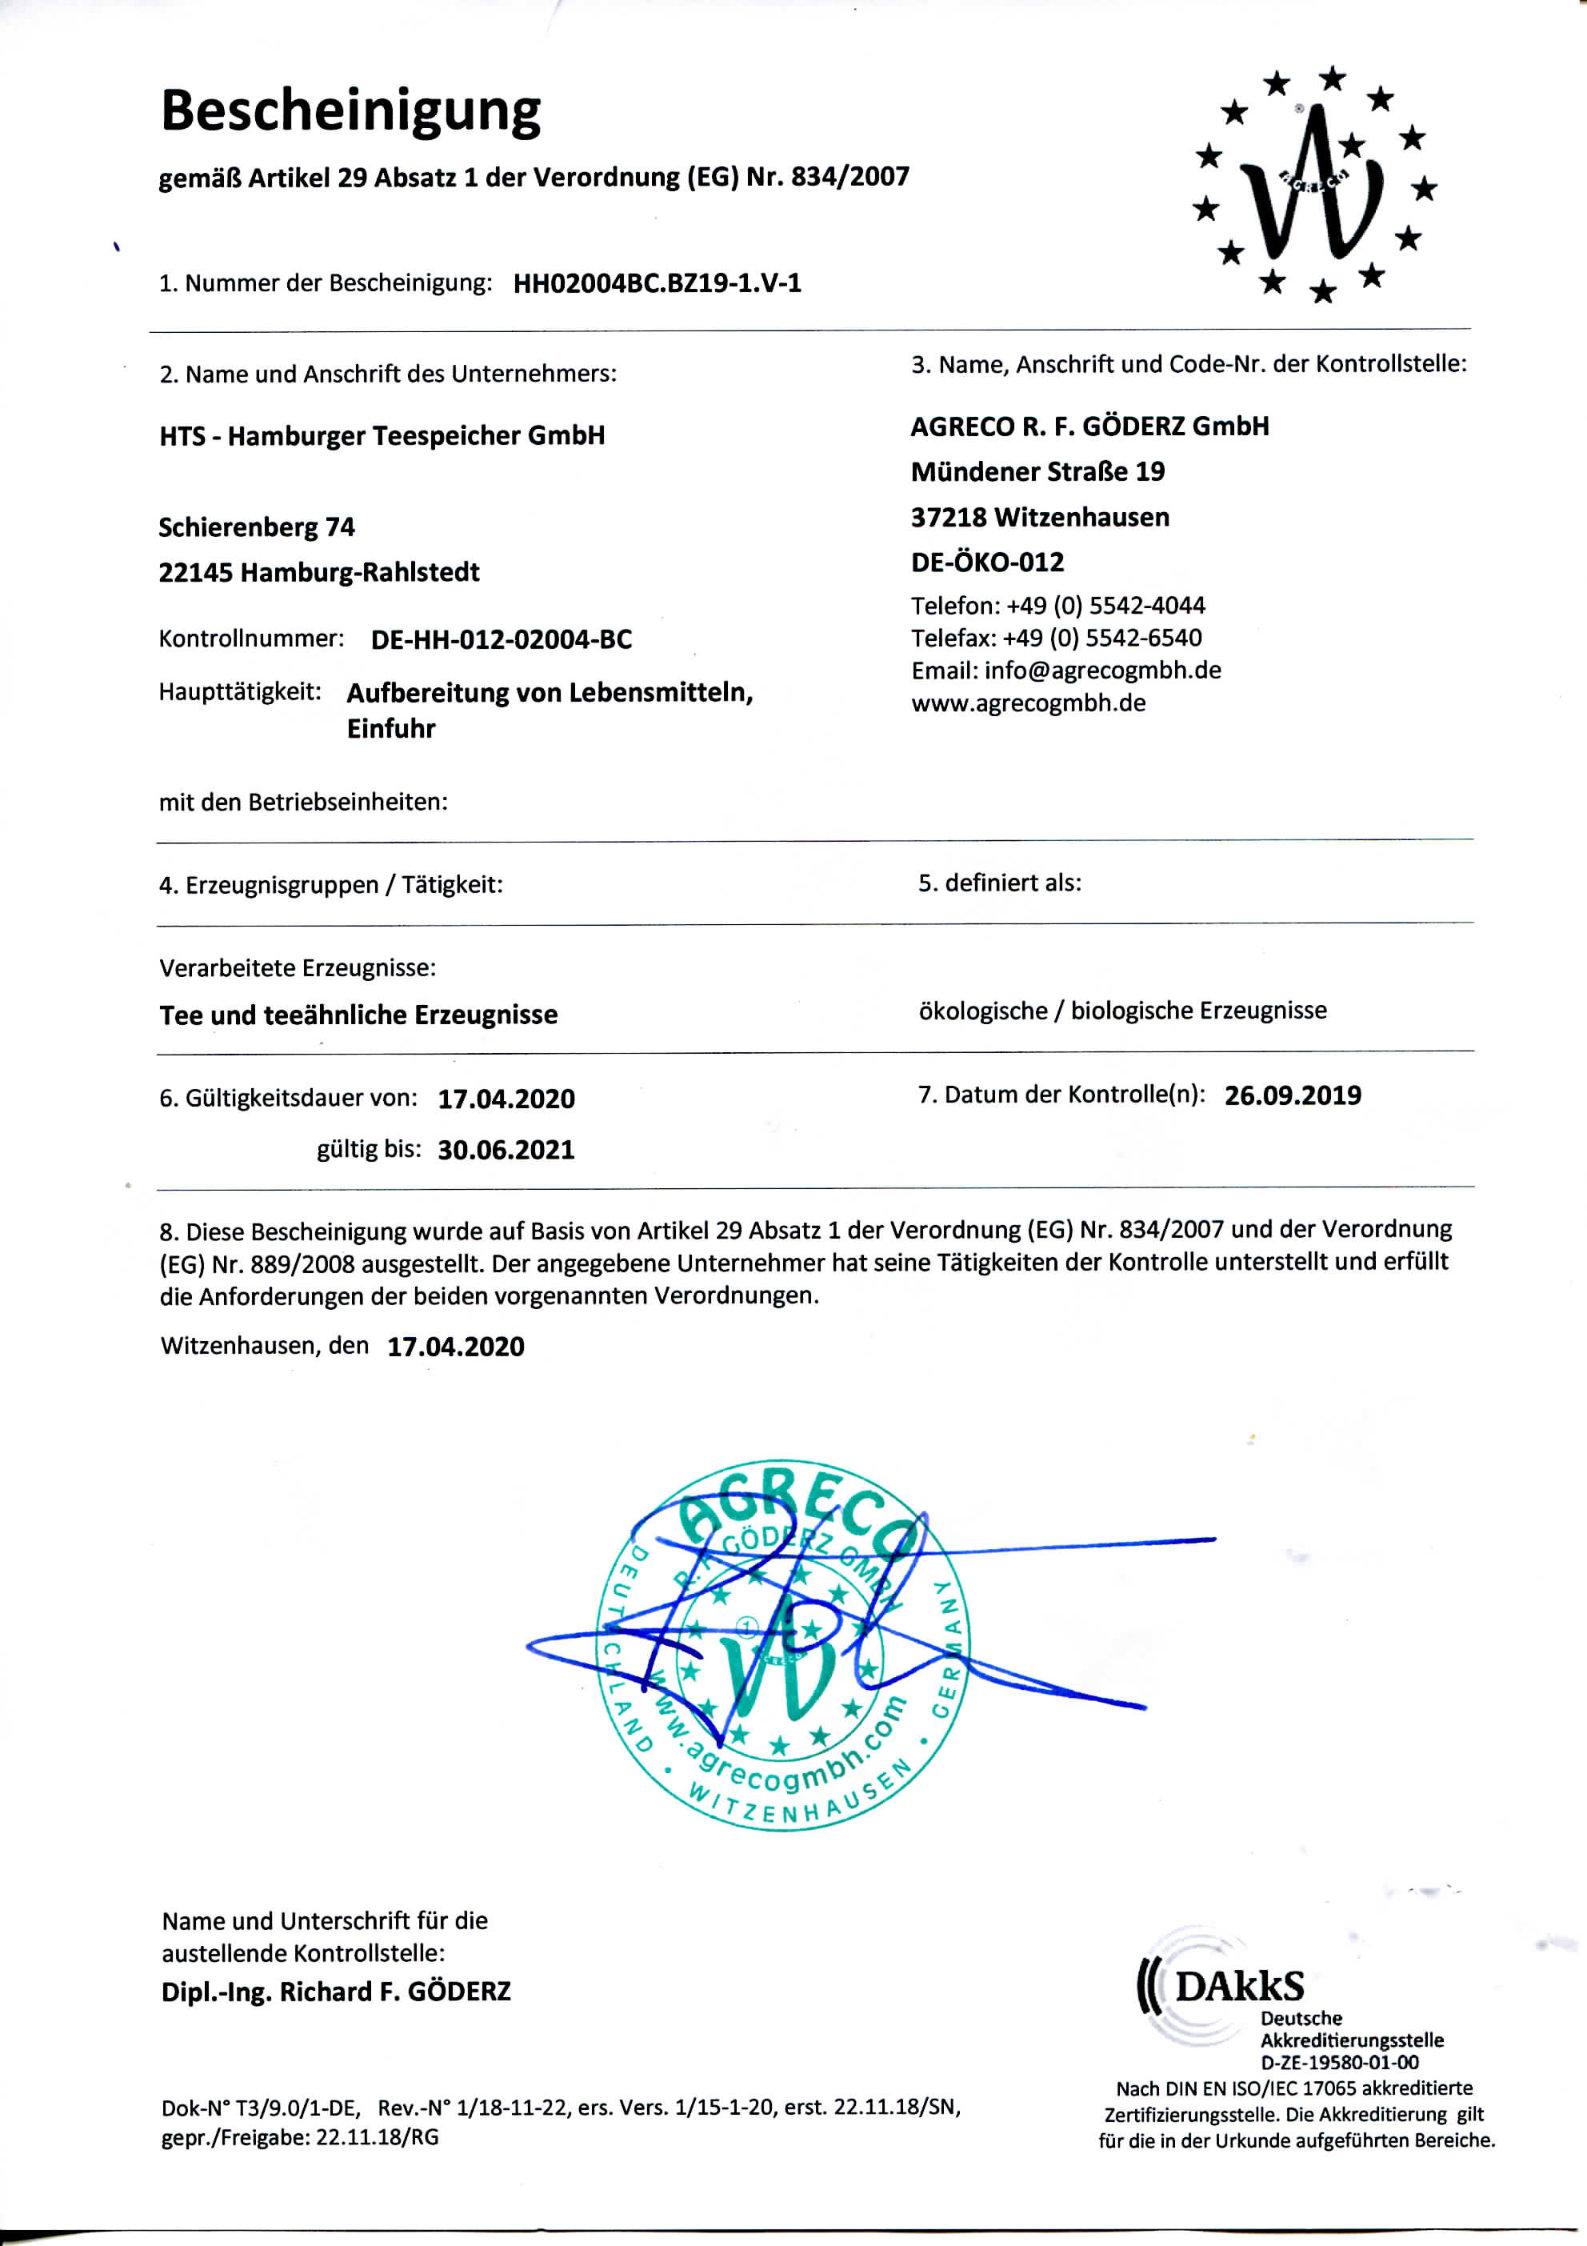 Betriebszertifikat-HTS-ab-17-04-2020